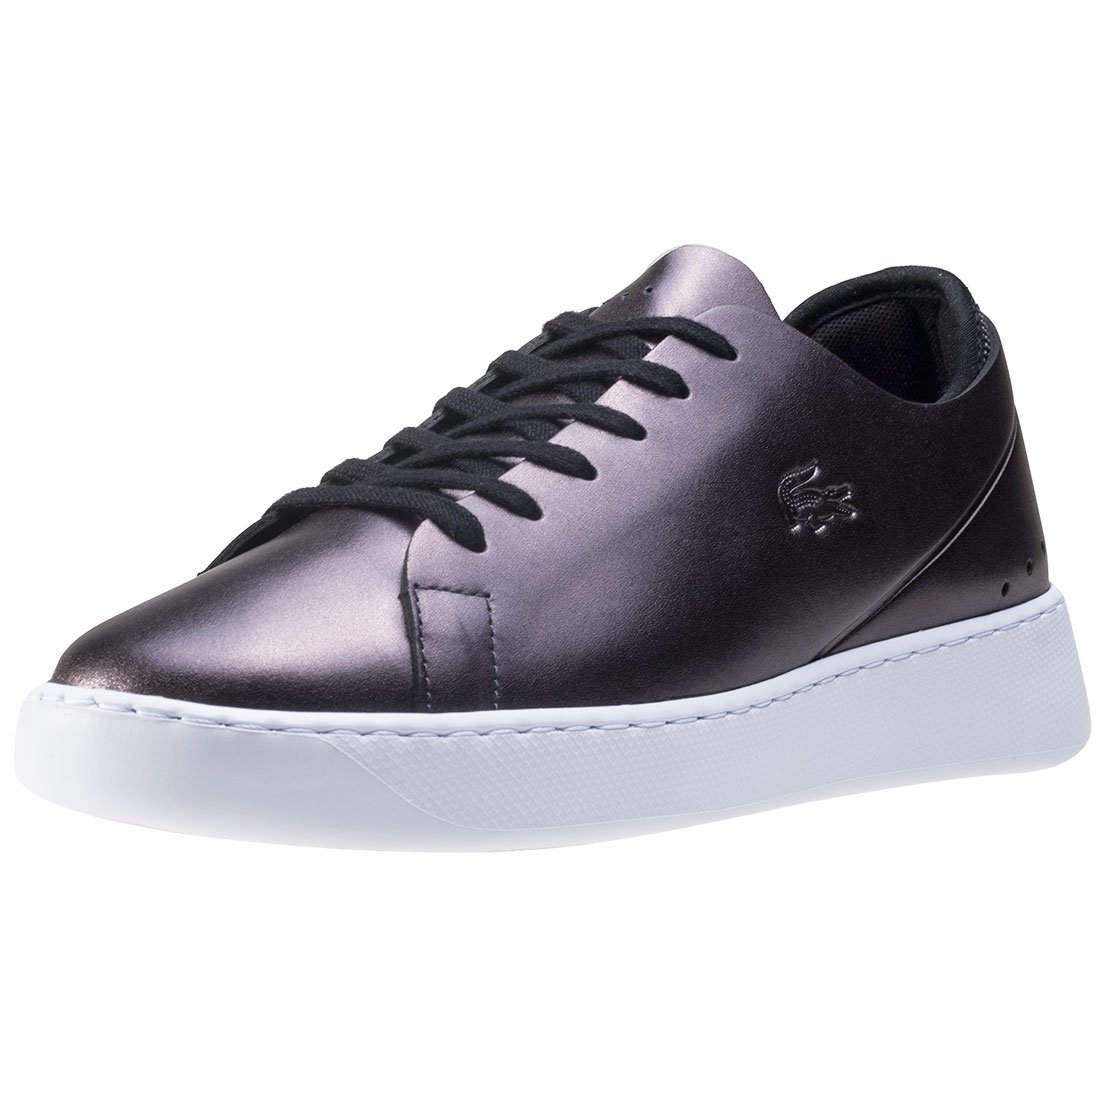 fe0471d75025 Lacoste Eyyla 317 Womens Trainers  Amazon.co.uk  Shoes   Bags